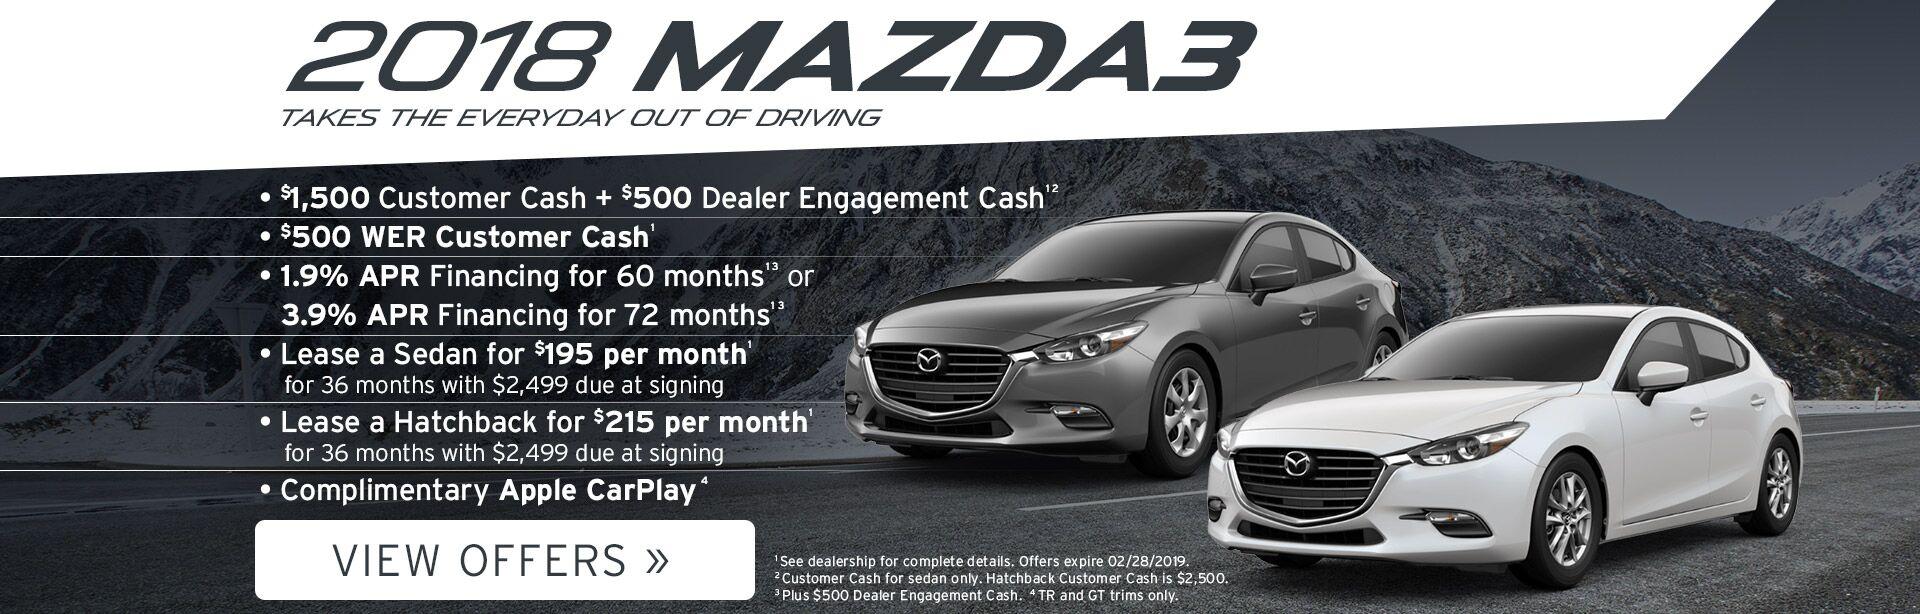 Mesa Arizona Mazda Dealership Cardinaleway Mazda Mesa